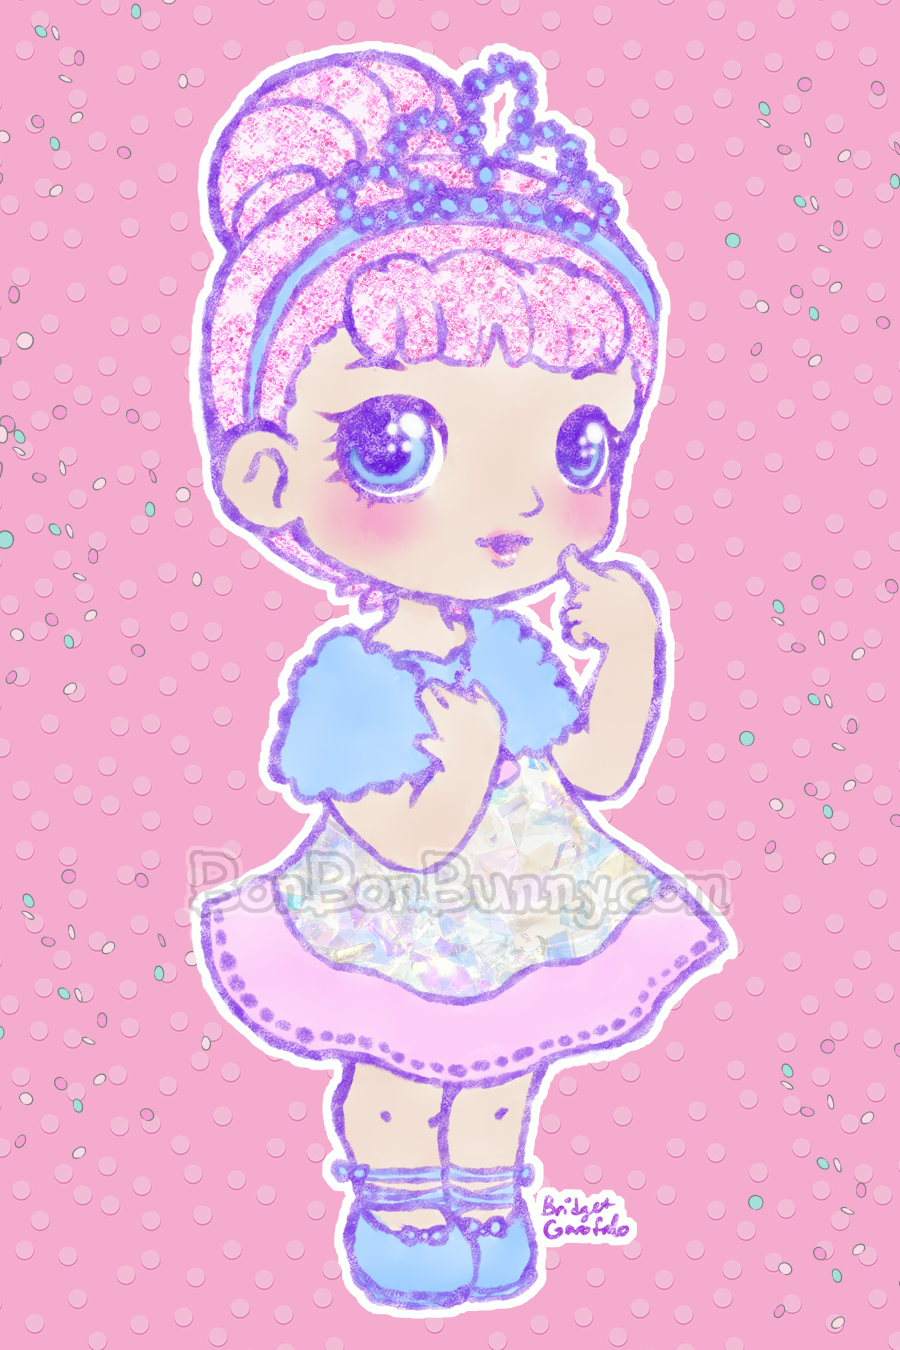 L.O.L. Surprise Doll Crystal Queen by Bon-Bon-Bunny